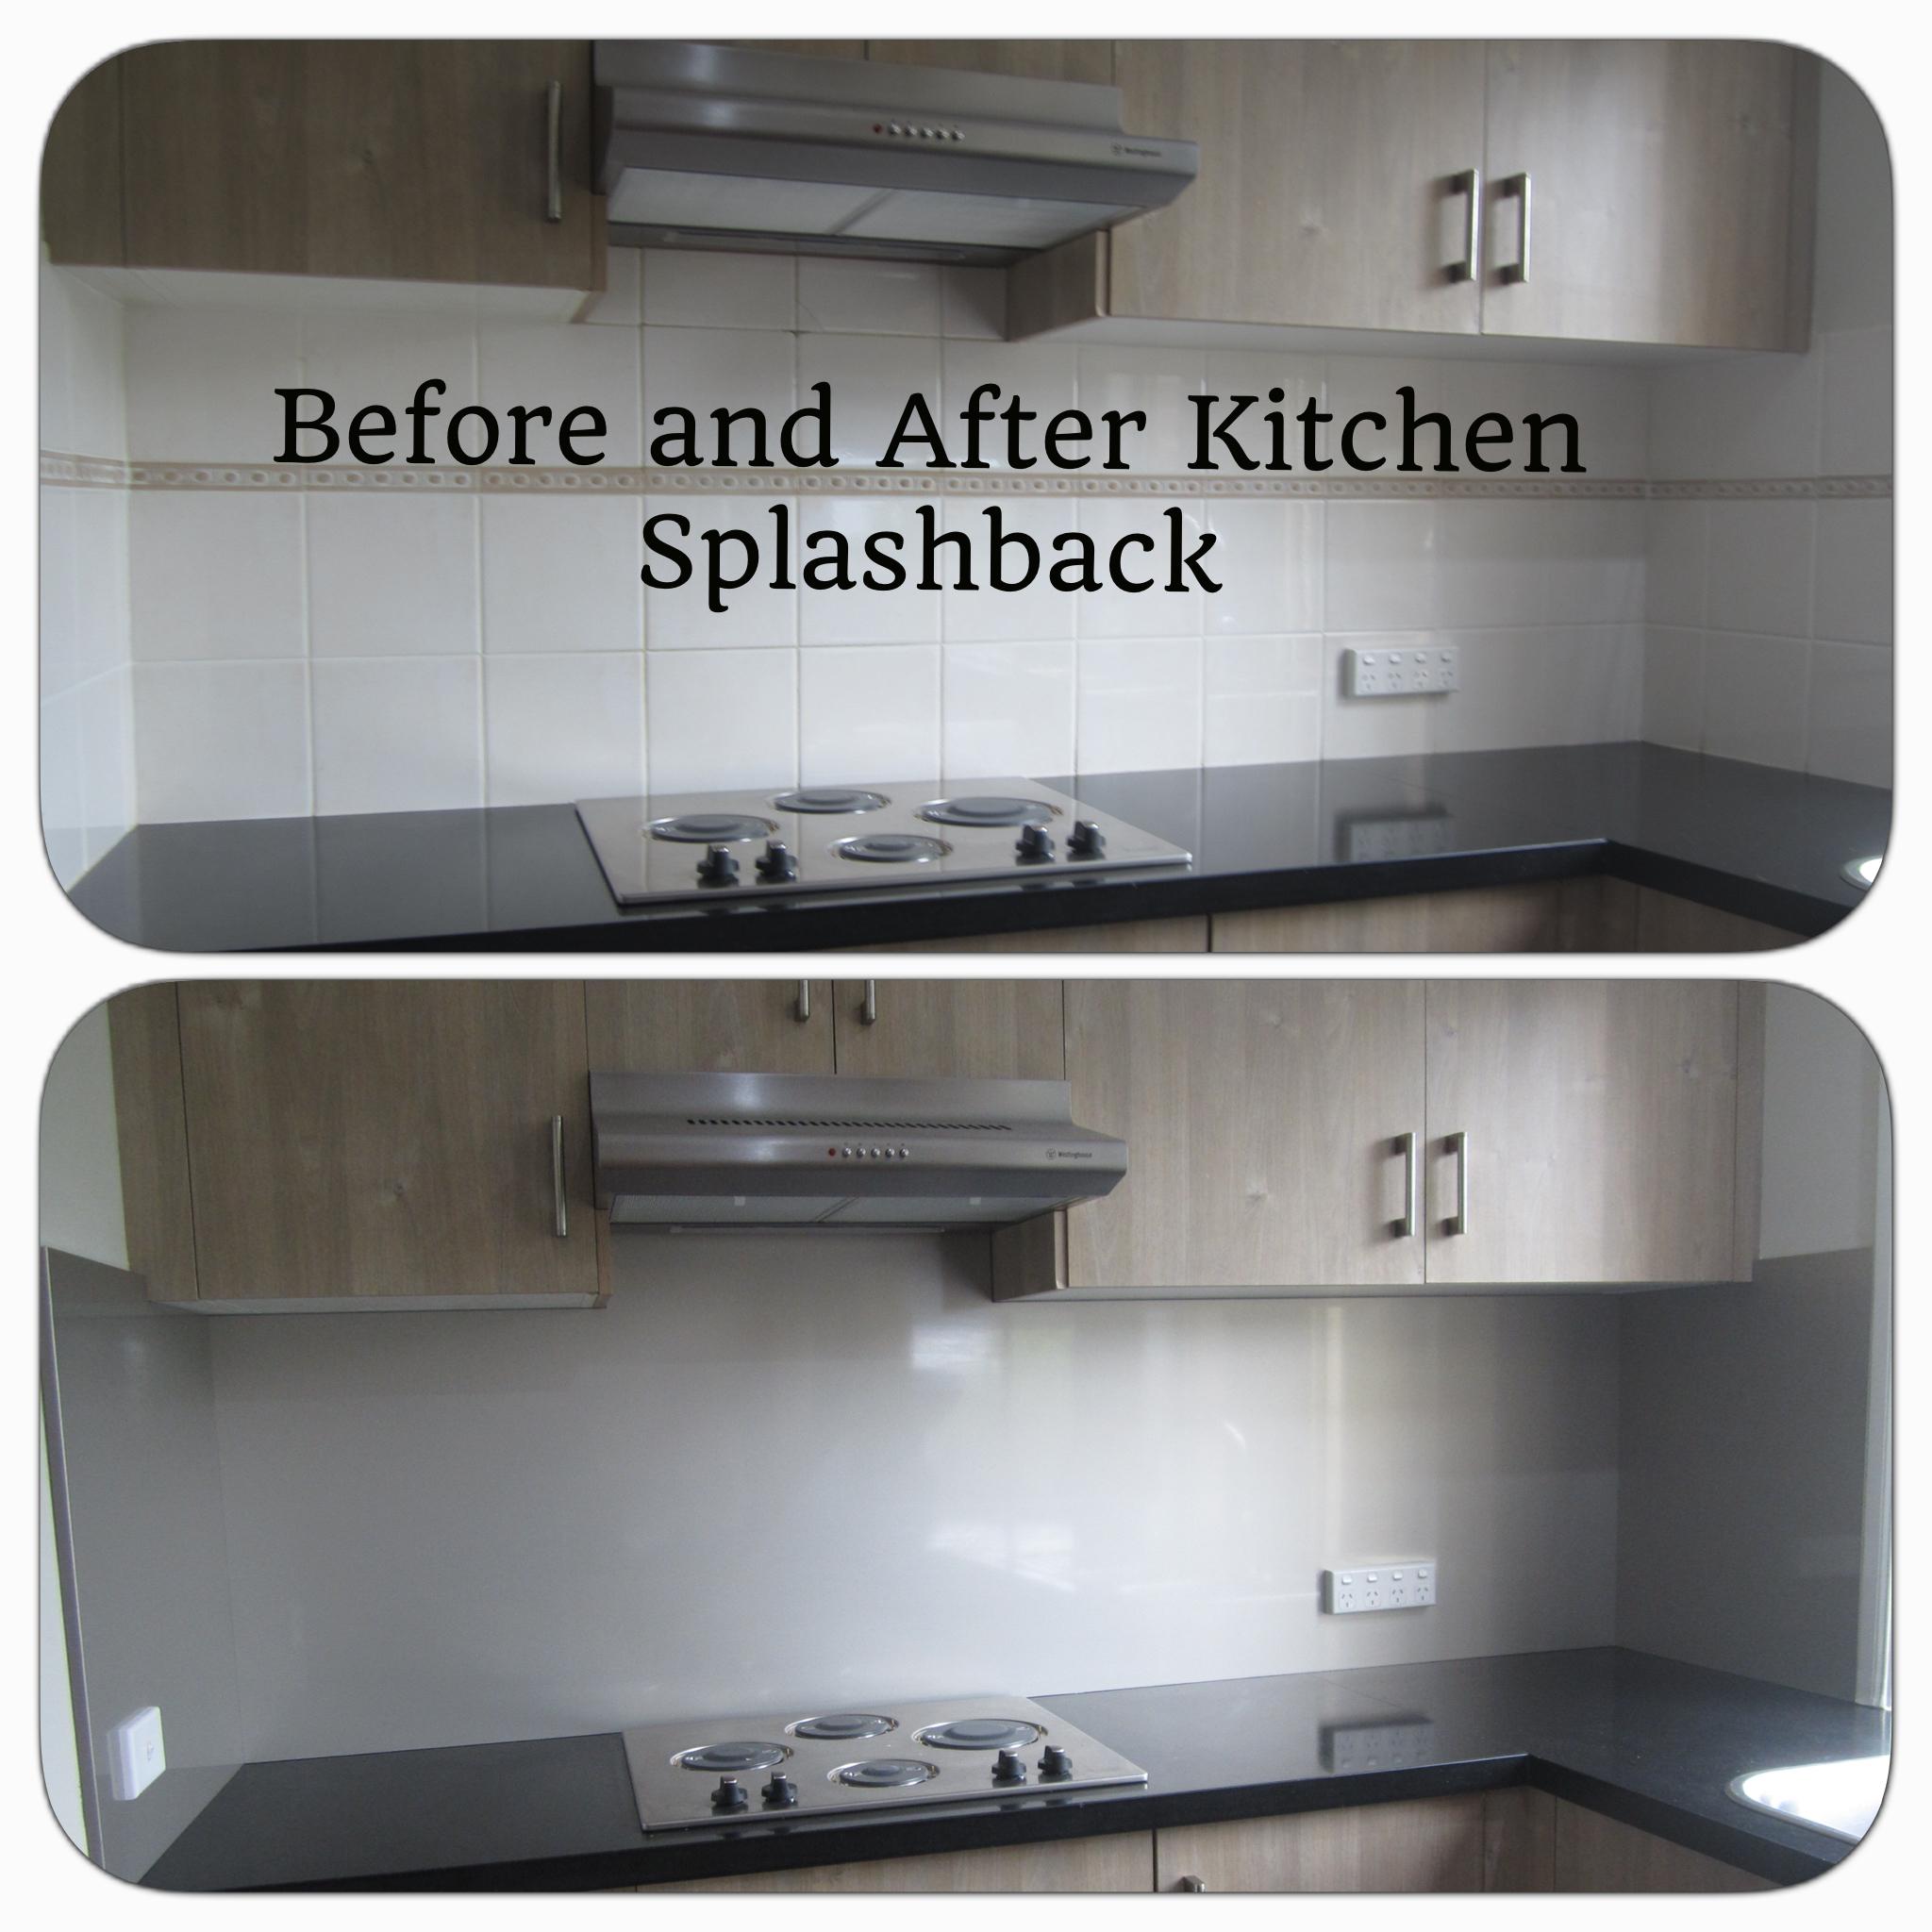 Bathroom Renovations Western Sydney: Kitchen Splashbacks : Before & After Photos